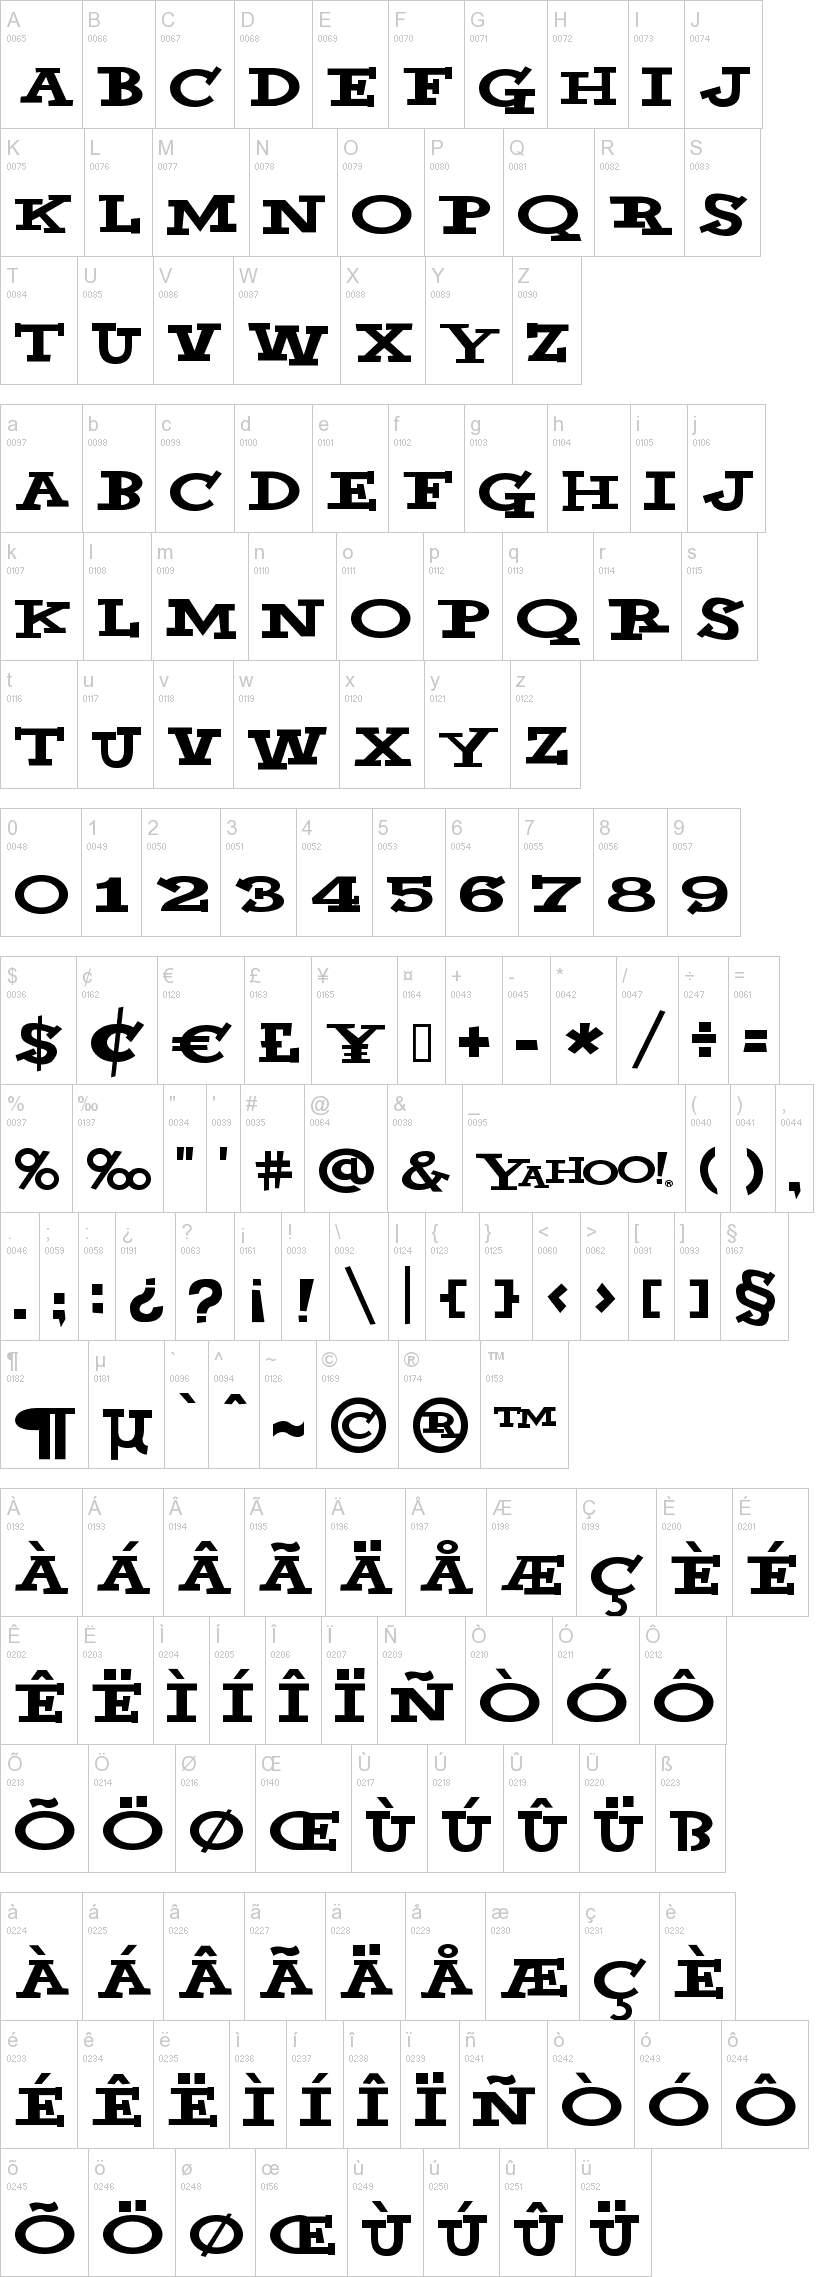 Yahoo font - ElaKiri Community